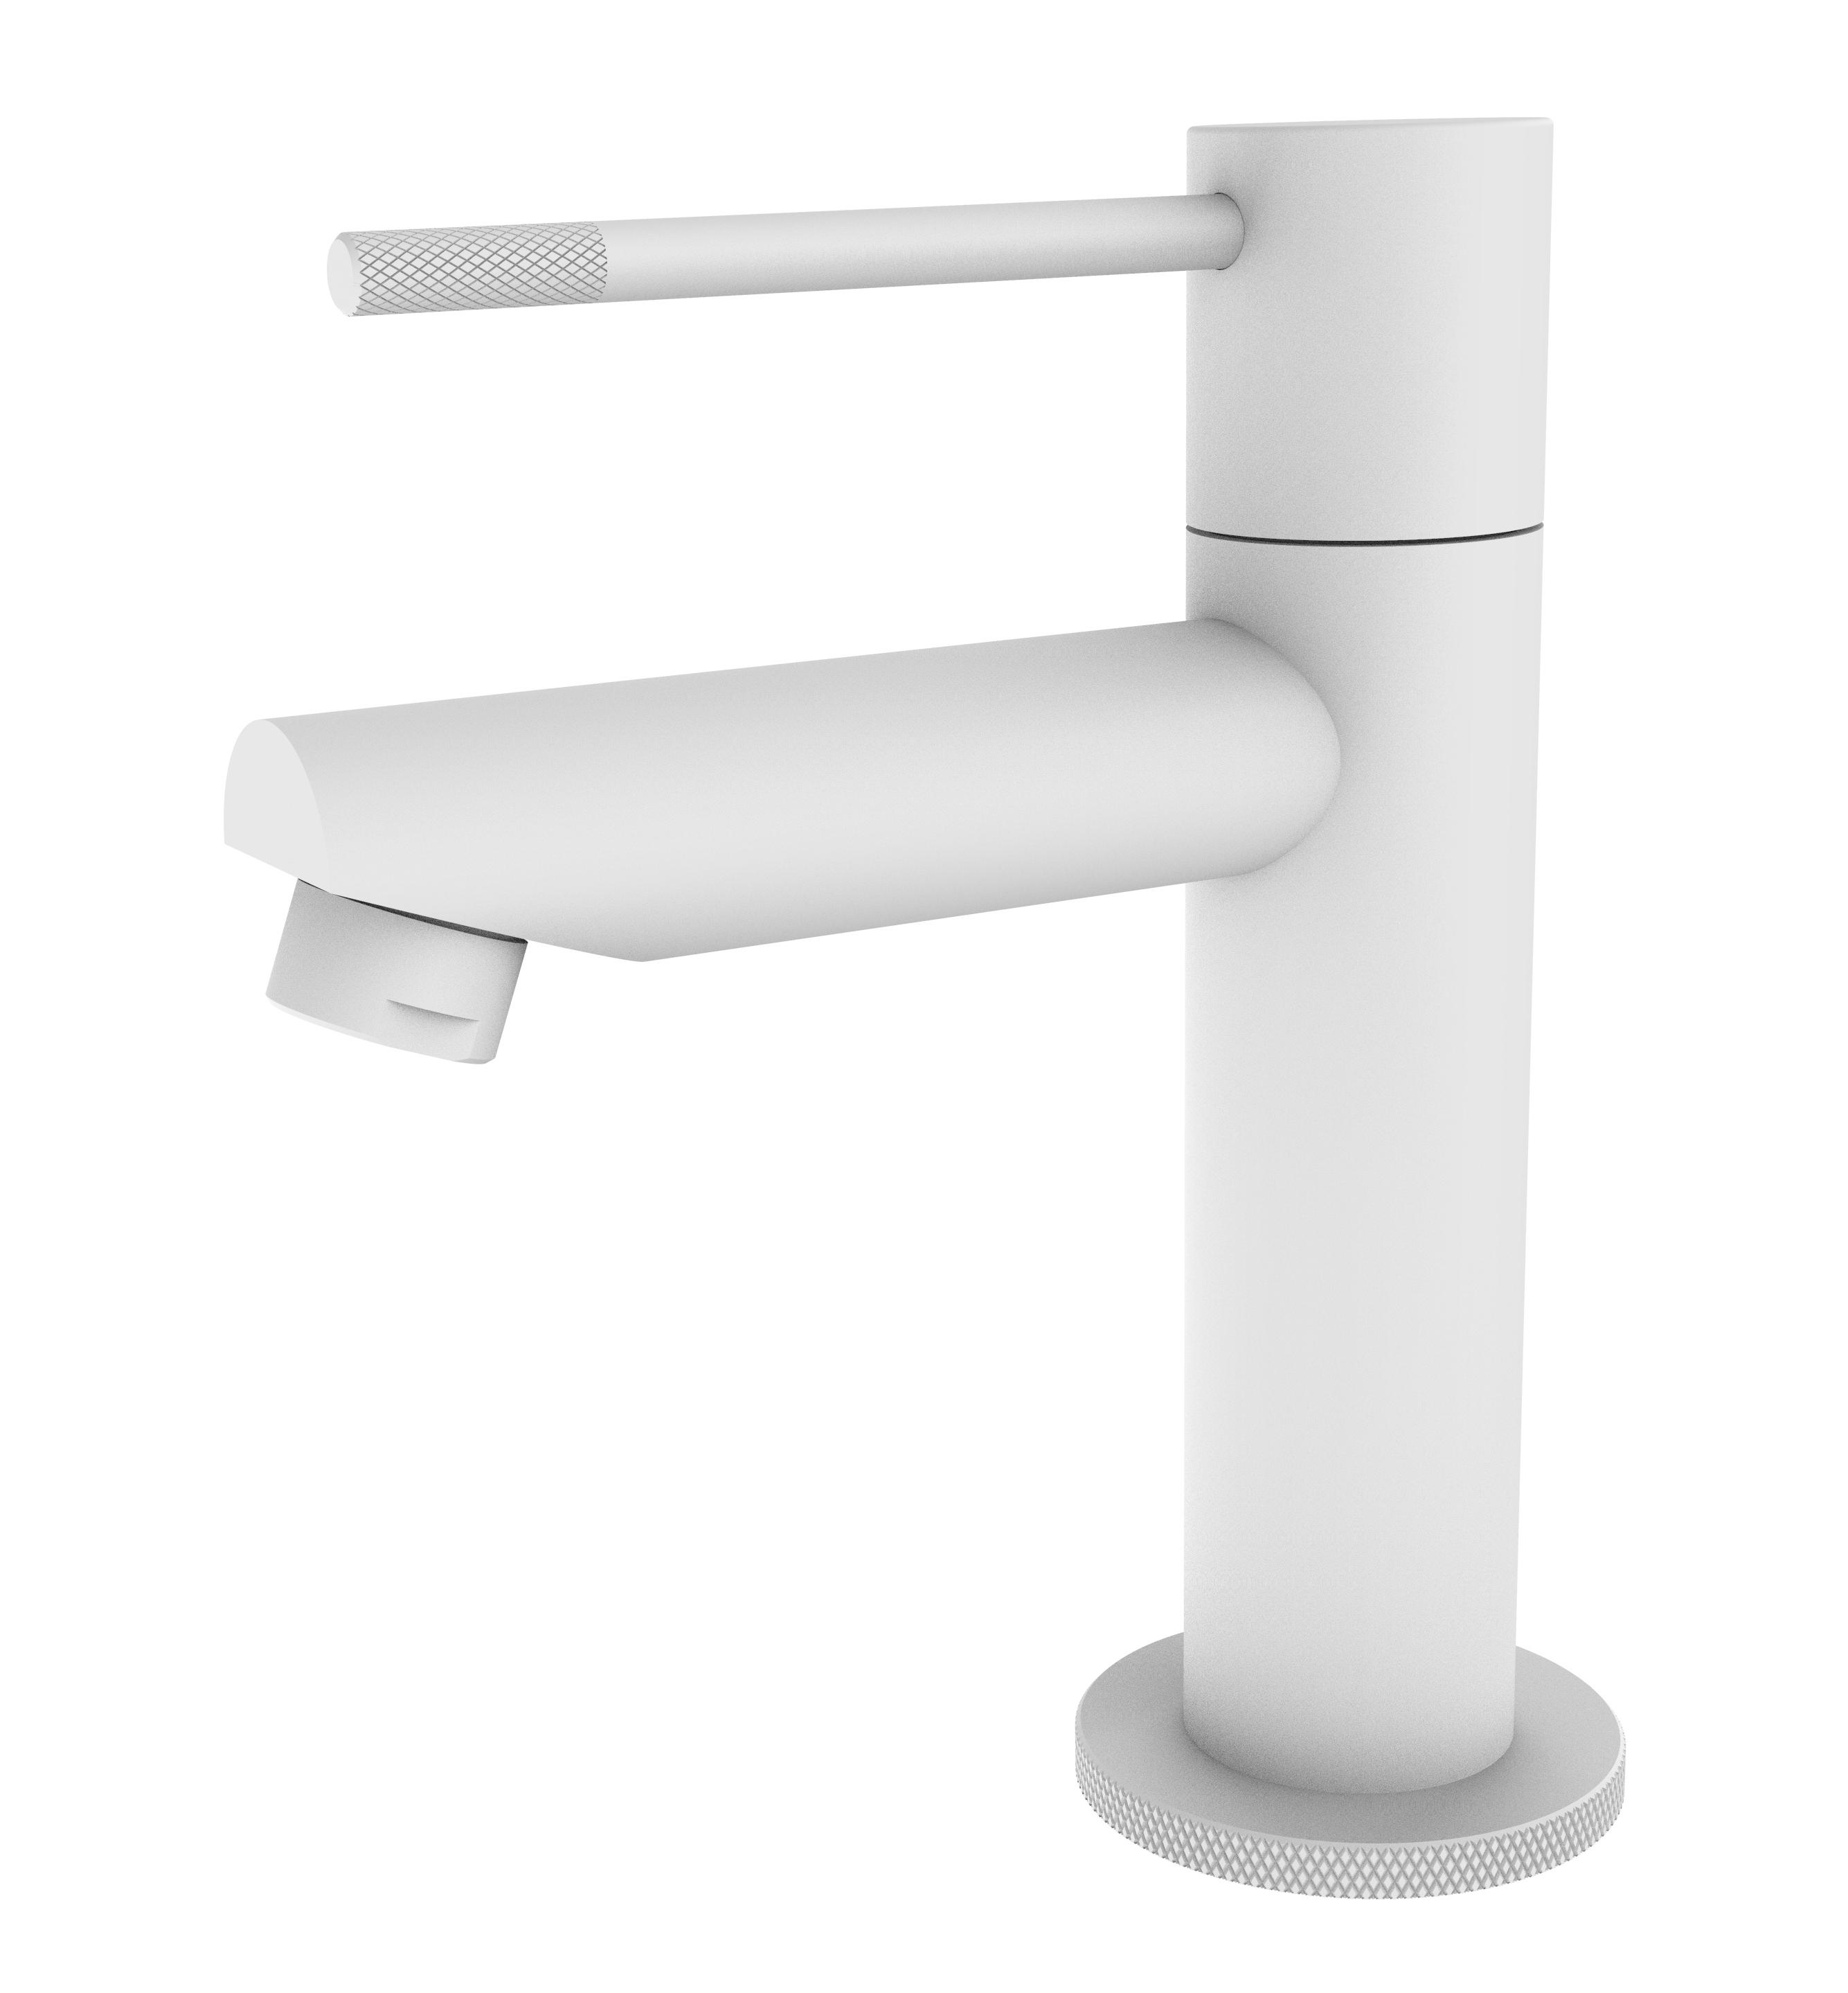 Best Design White Union toiletkraan mat wit